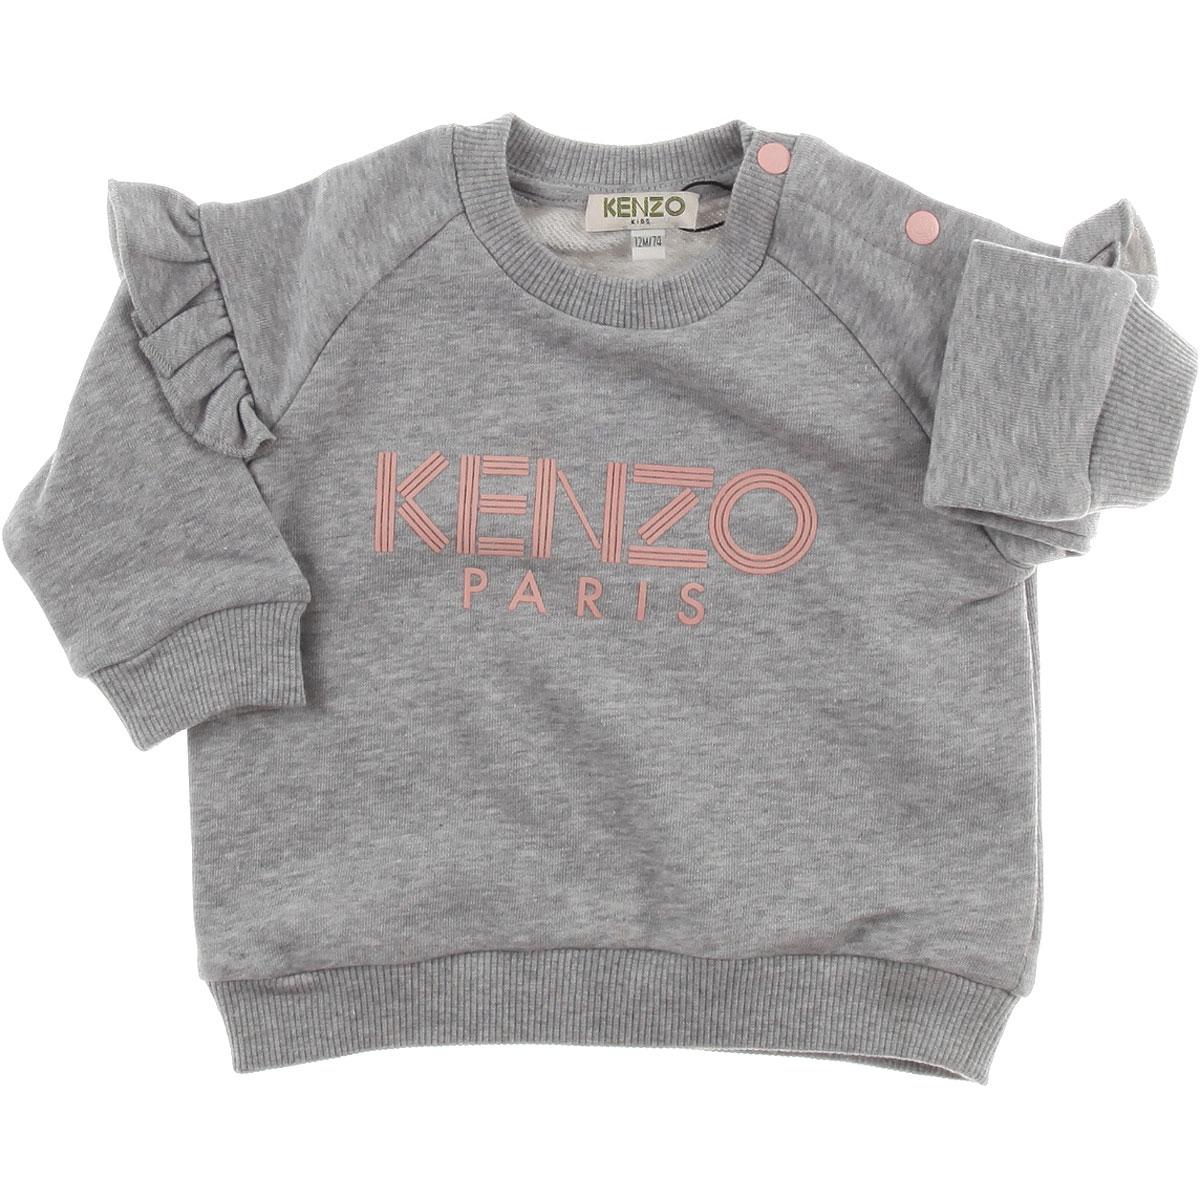 Image of Kenzo Baby Sweatshirts & Hoodies for Girls, Grey, Cotton, 2017, 12M 18M 2Y 3Y 4Y 6M